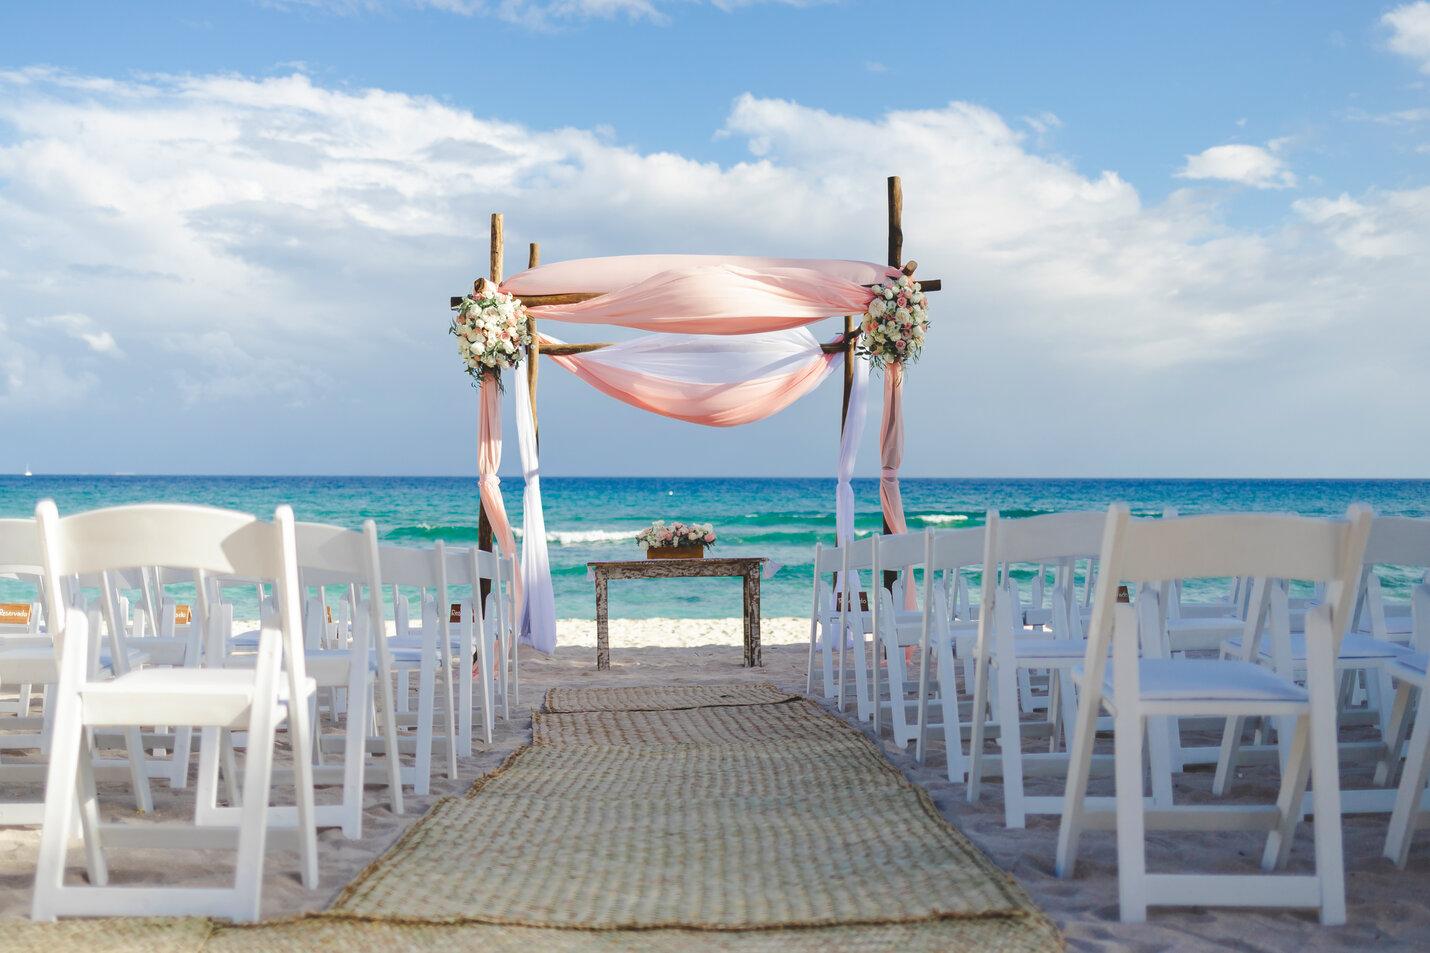 Wedding Etiquette for Hosting a Destination Wedding